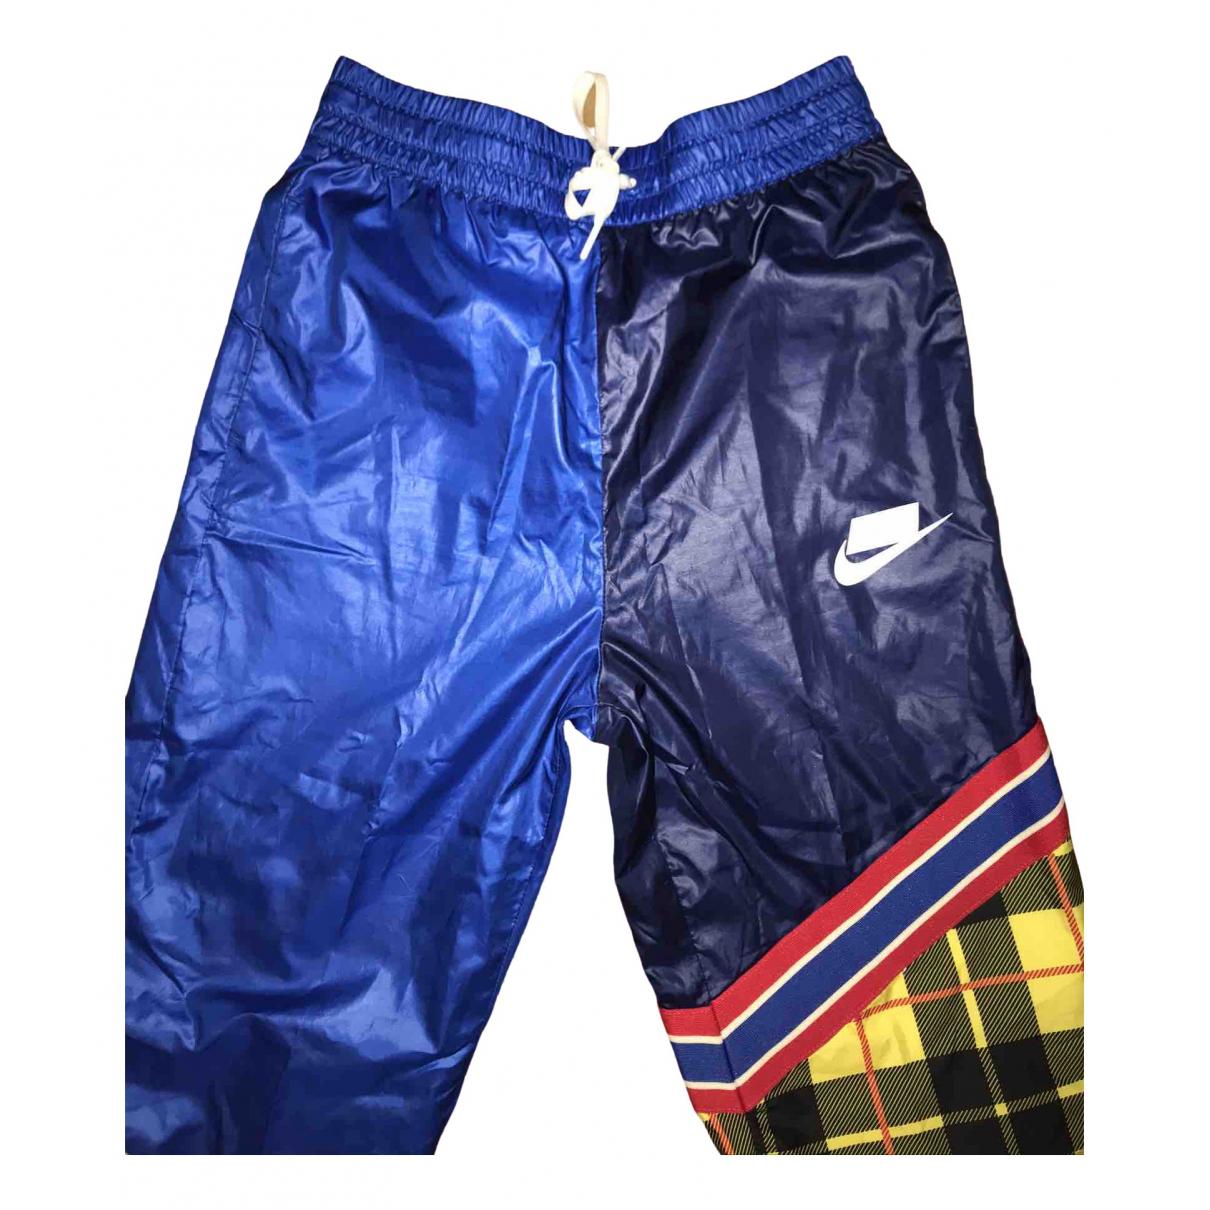 Nike \N Multicolour Trousers for Women XS International